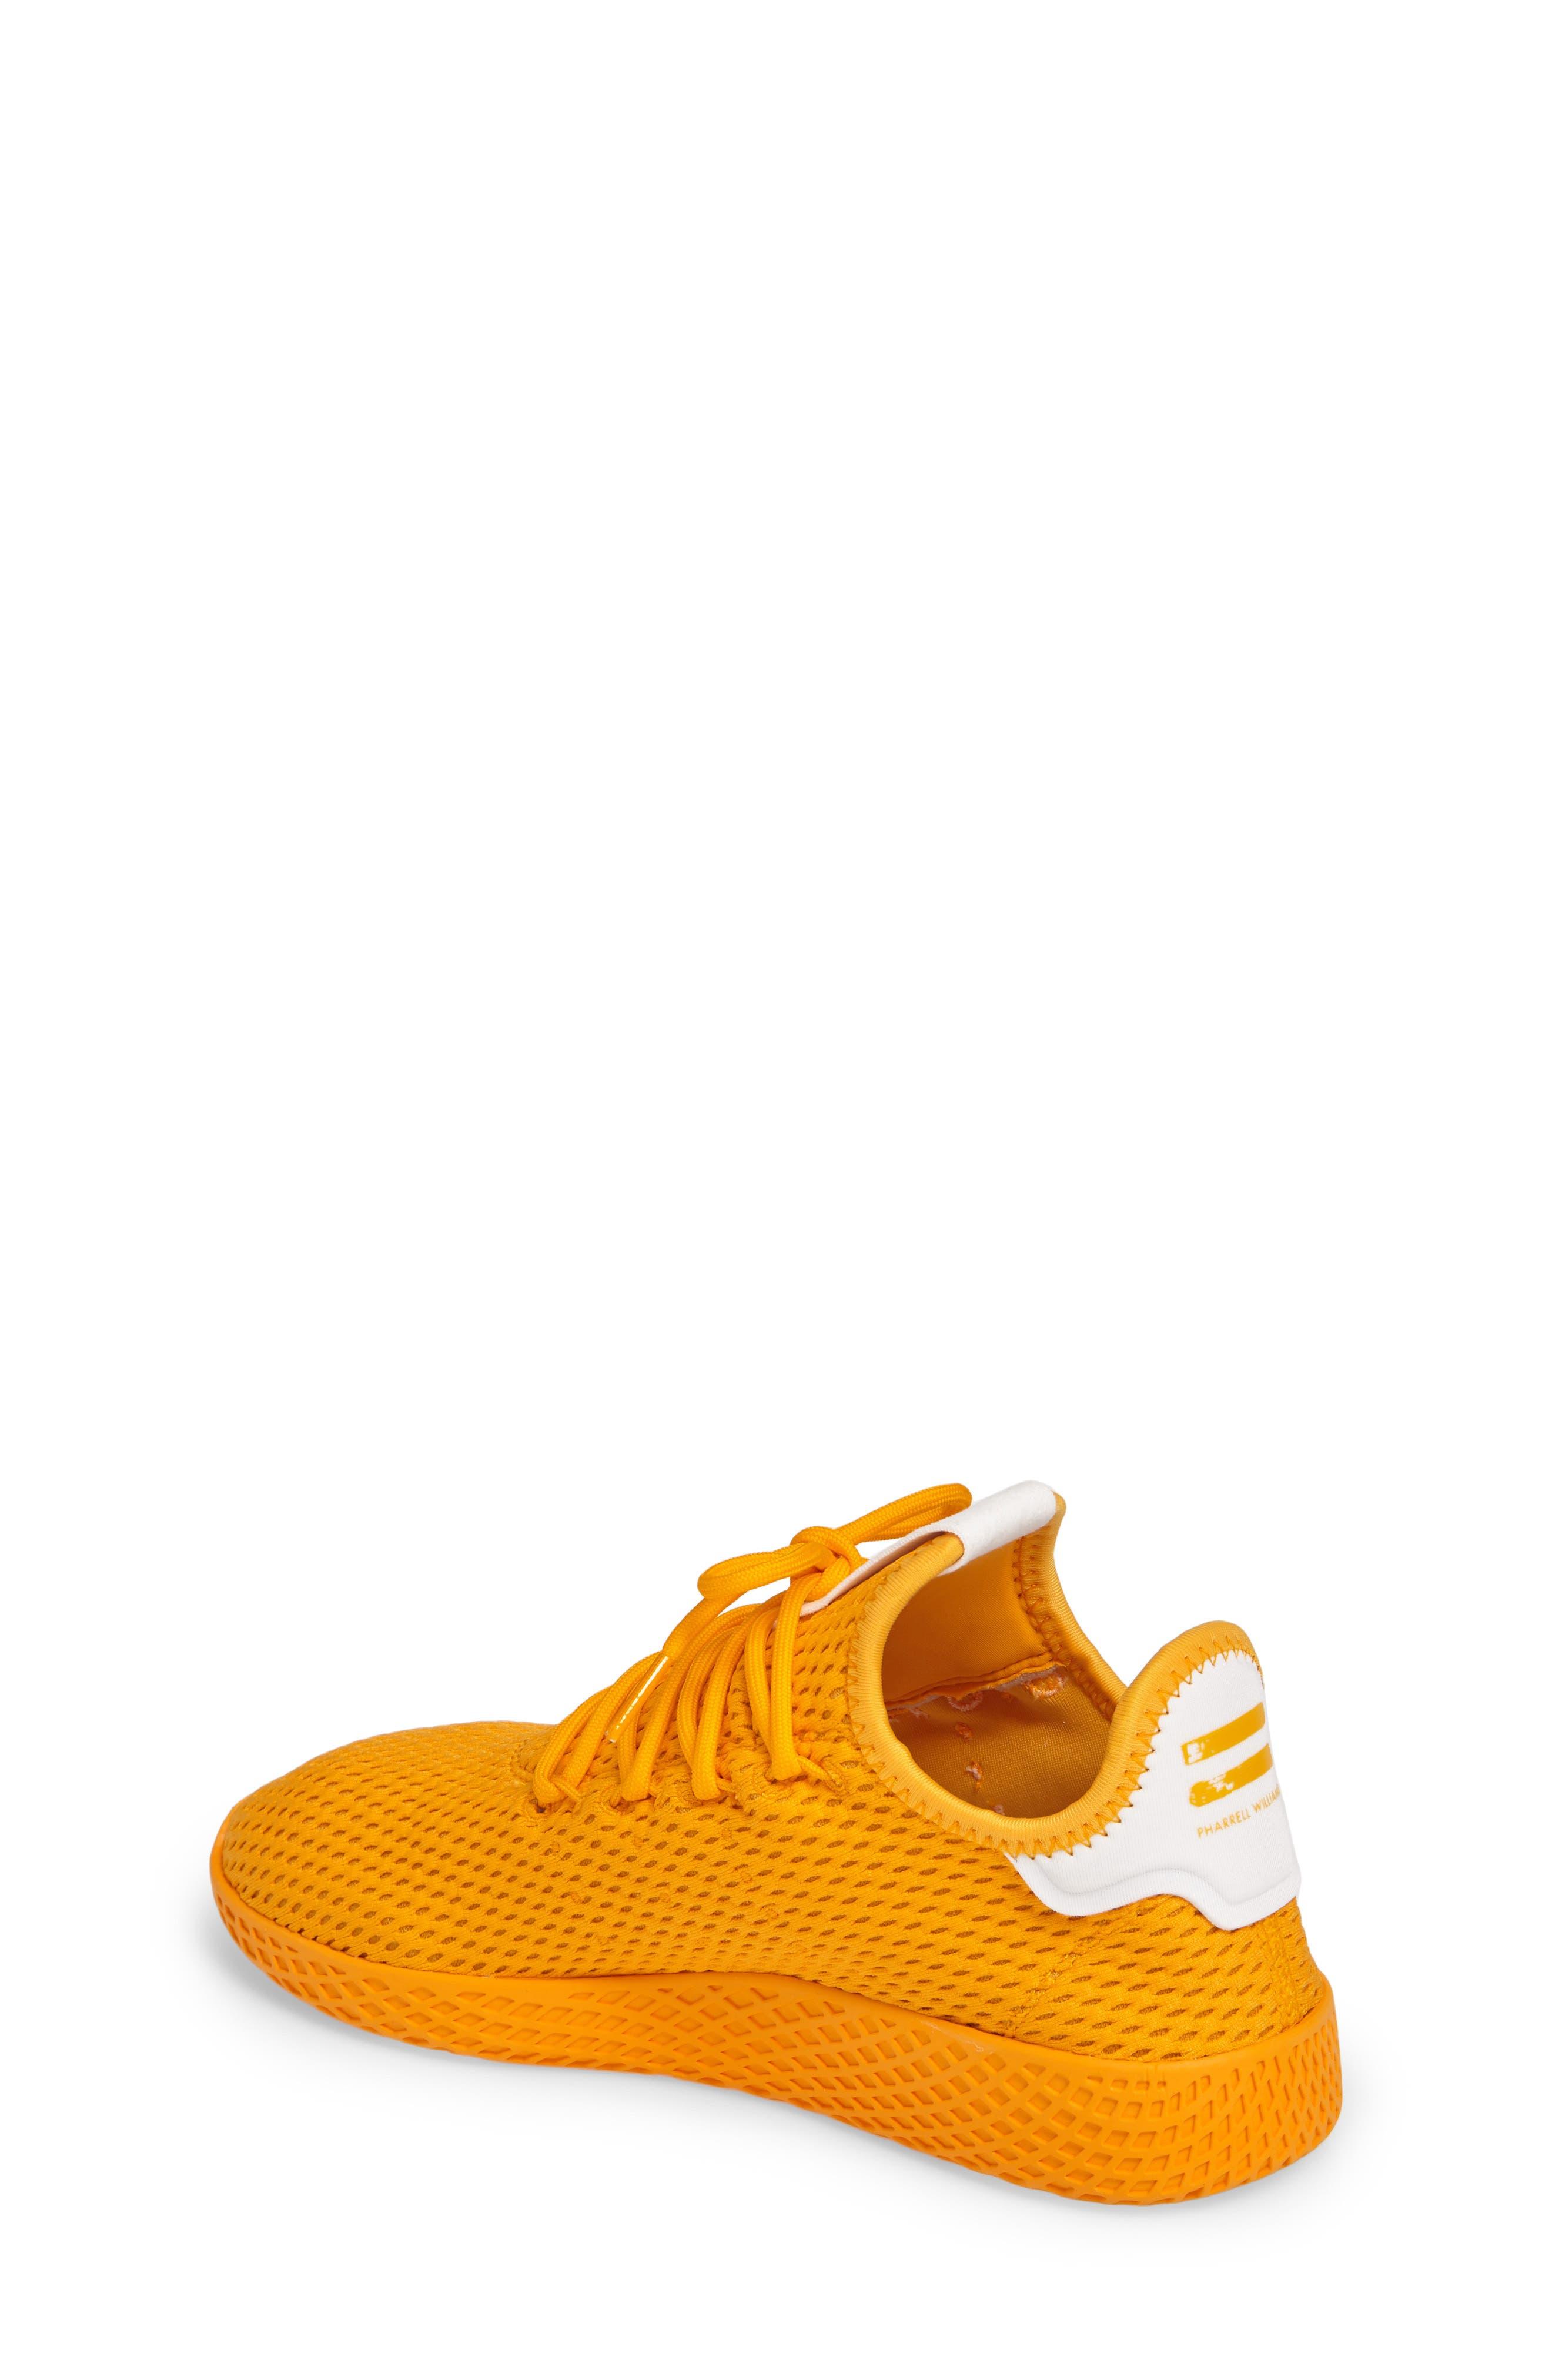 Alternate Image 2  - adidas Originals x Pharrell Williams The Summers Mesh Sneaker (Big Kid)